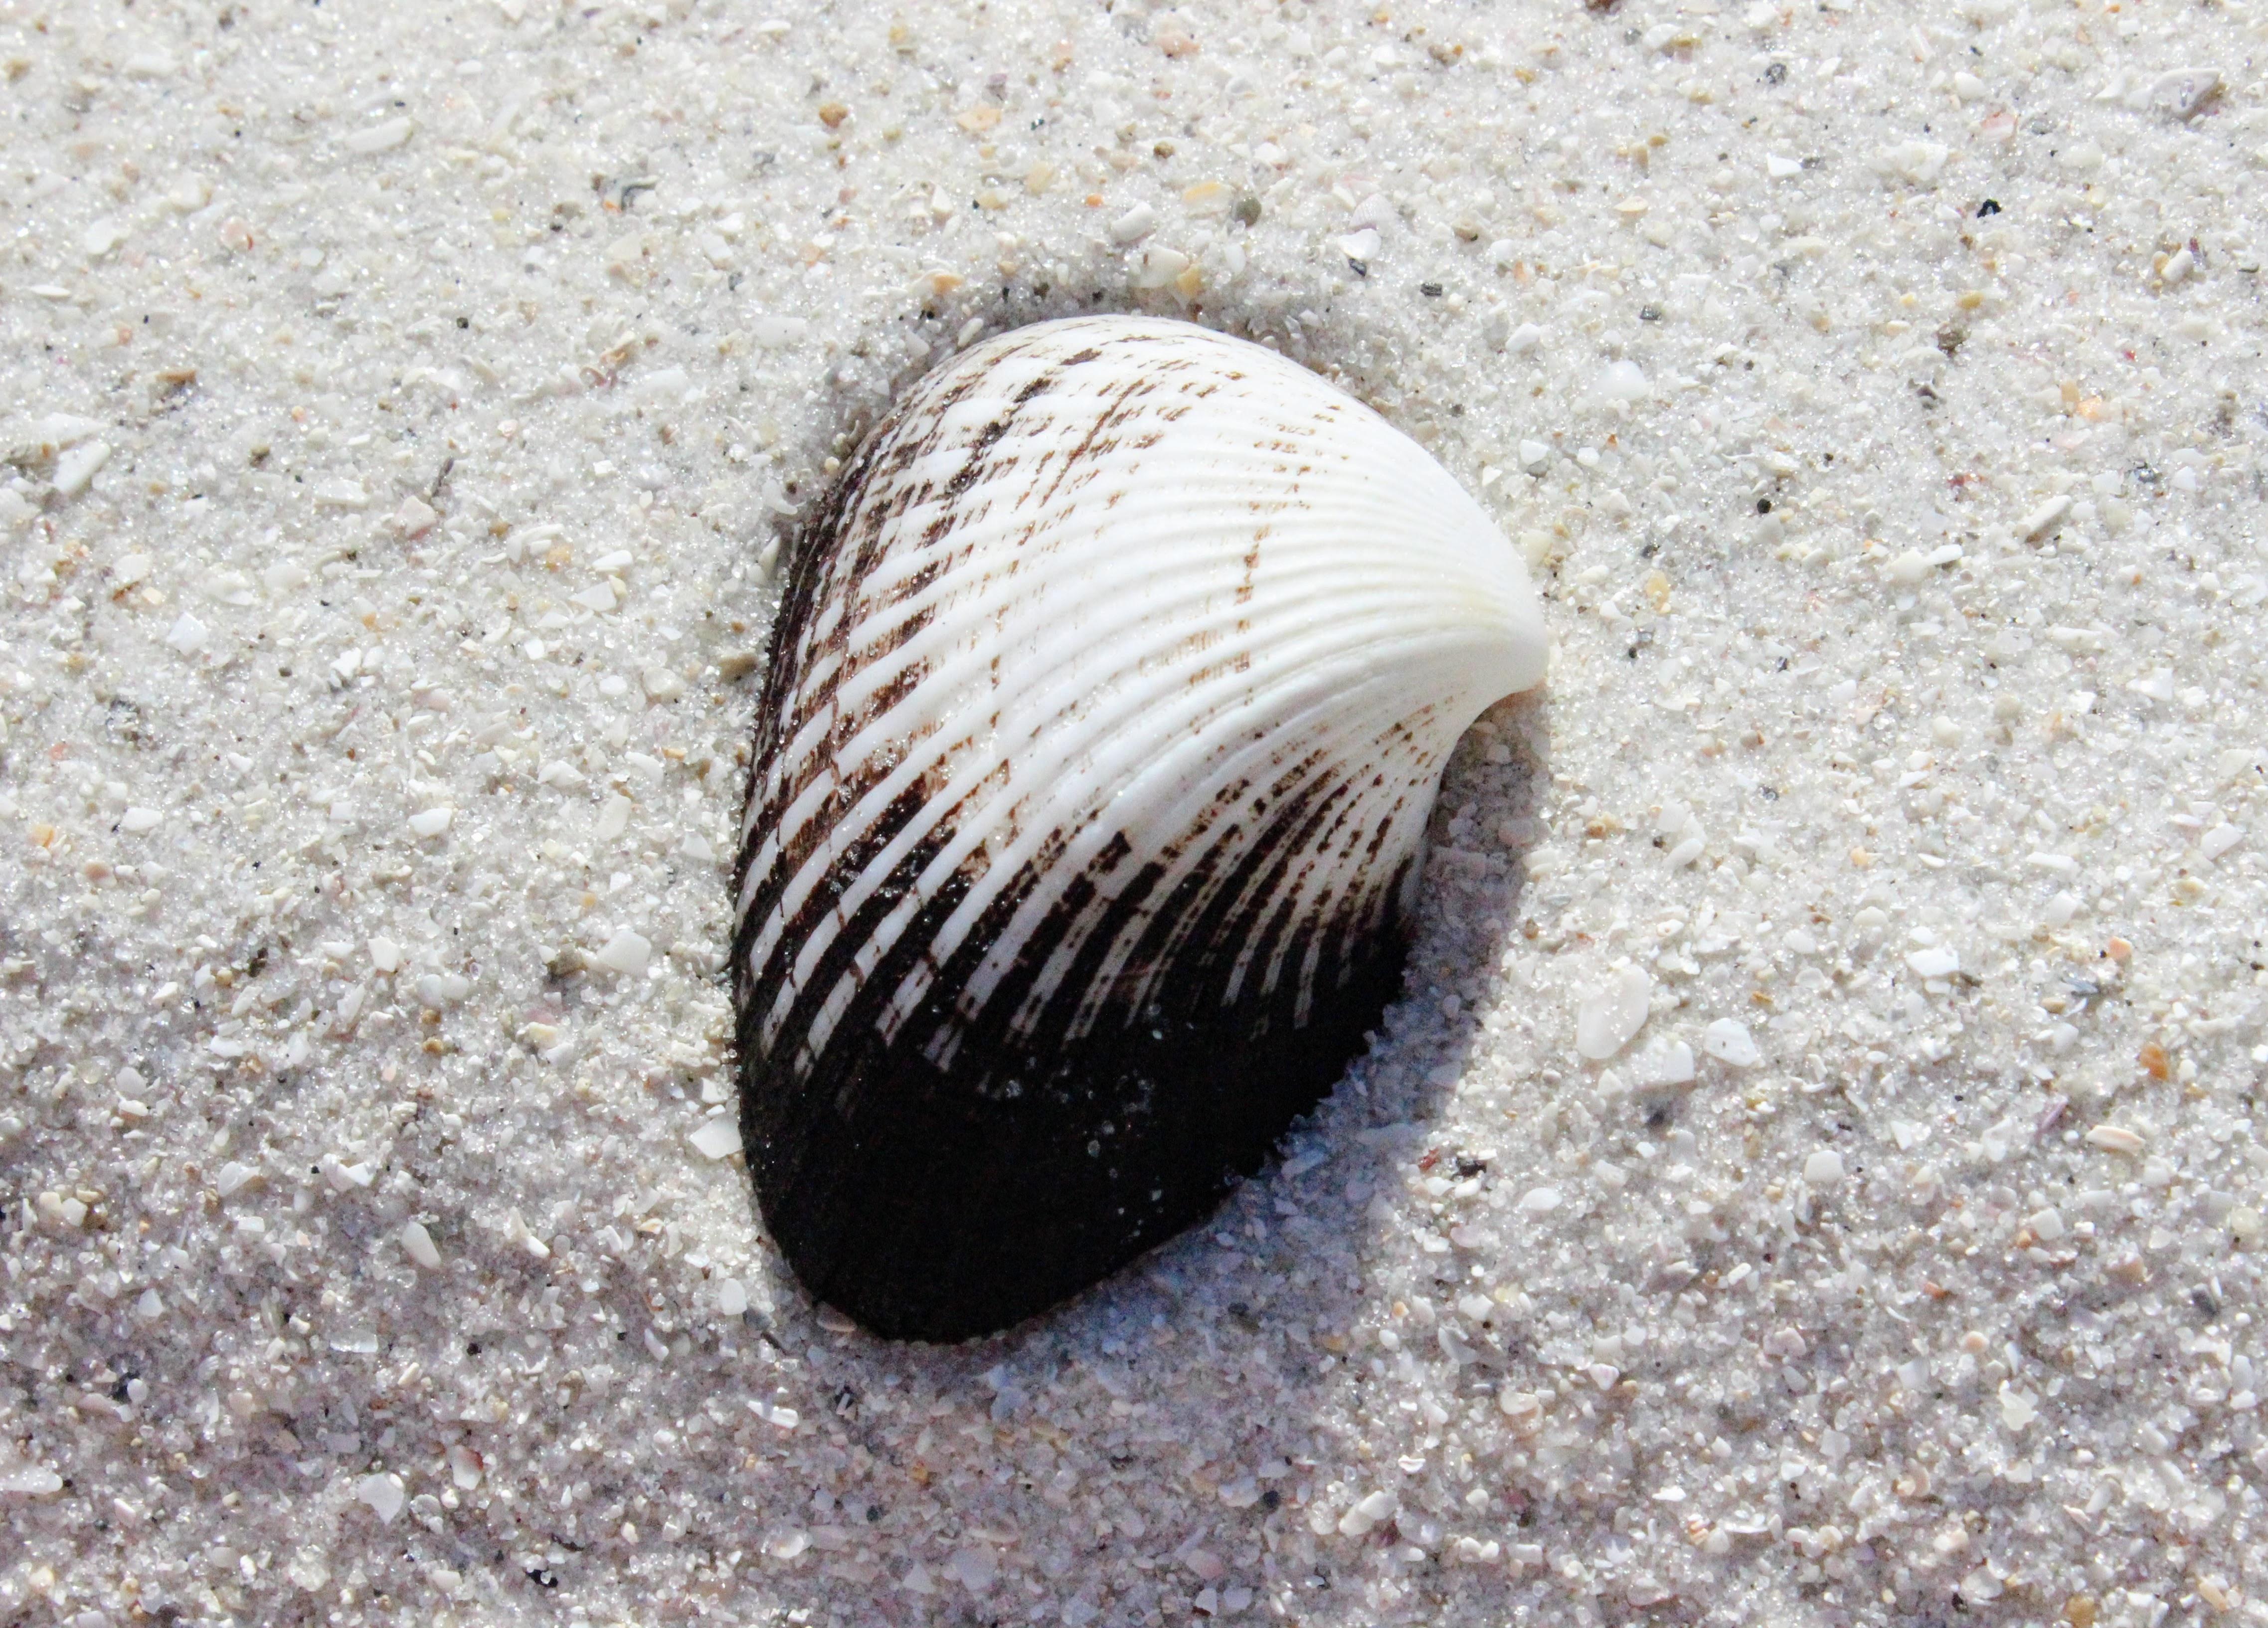 white and black seashell on white sand